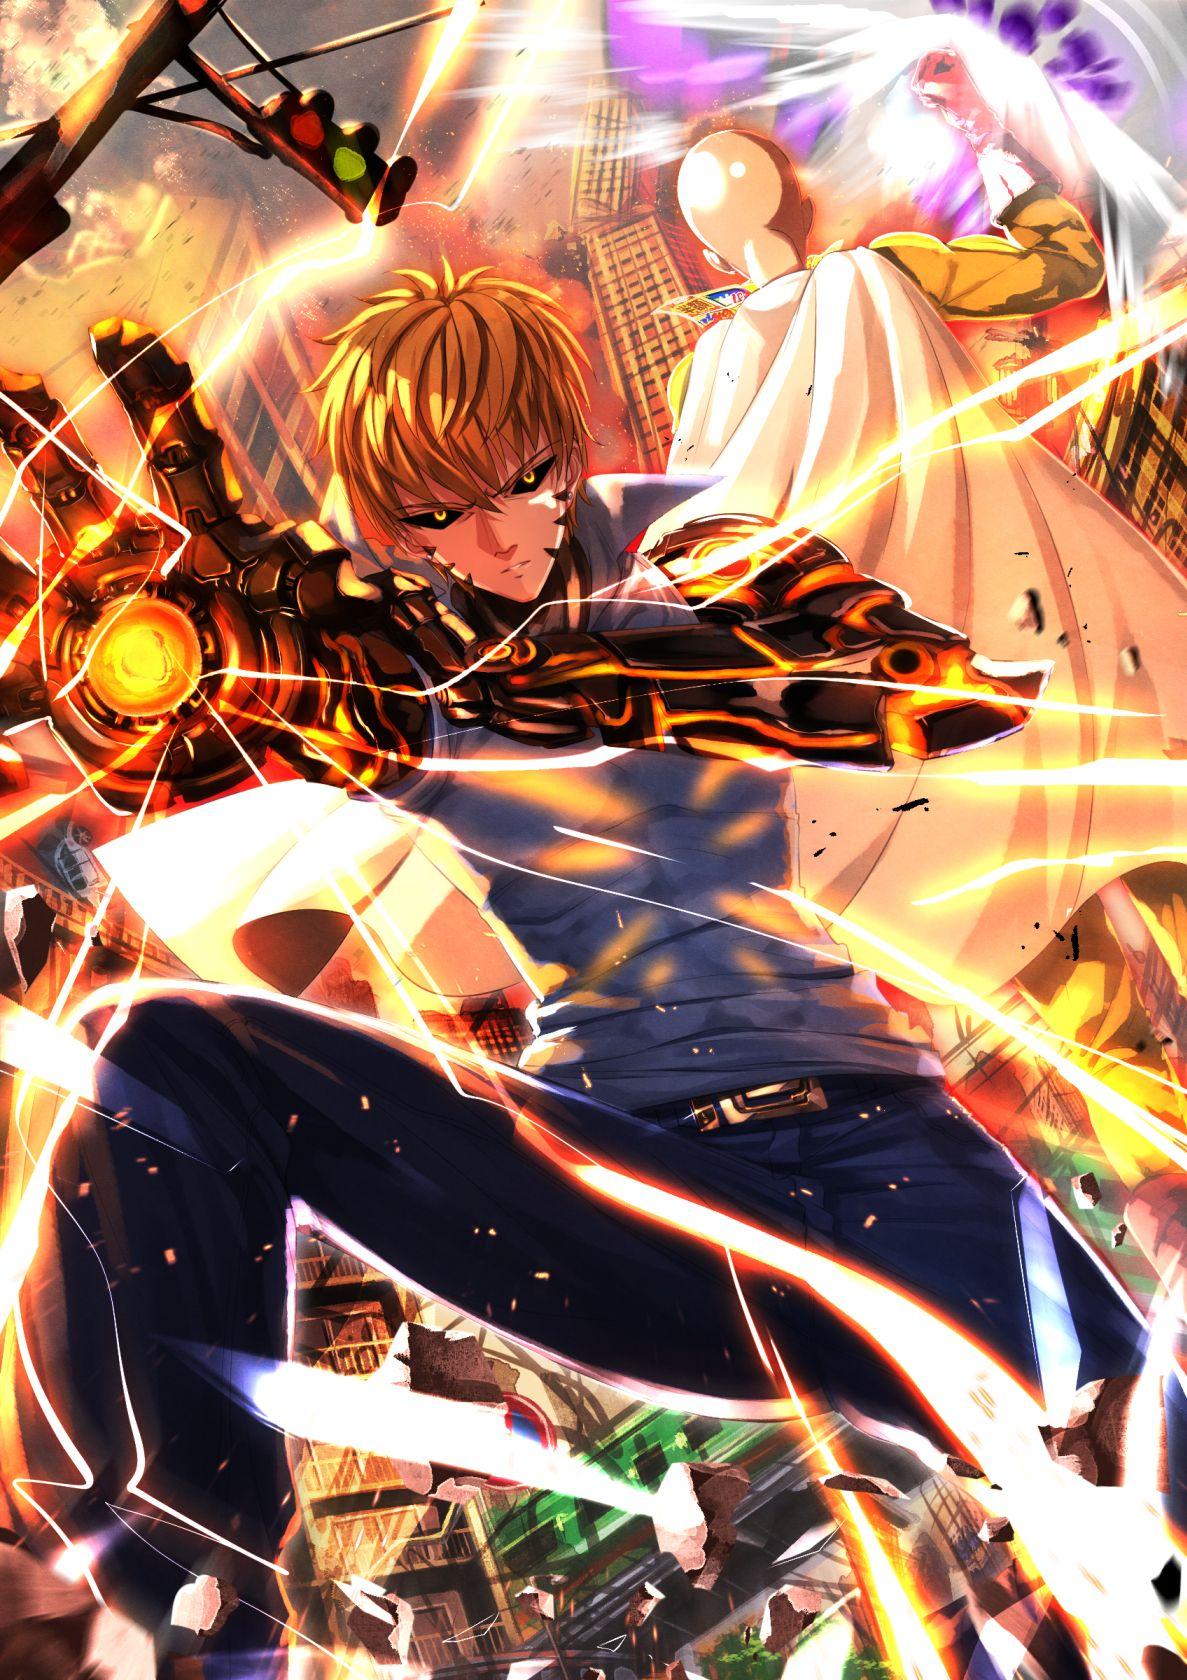 One Punch Man, Saitama (One Punch Man), Genos Anime one